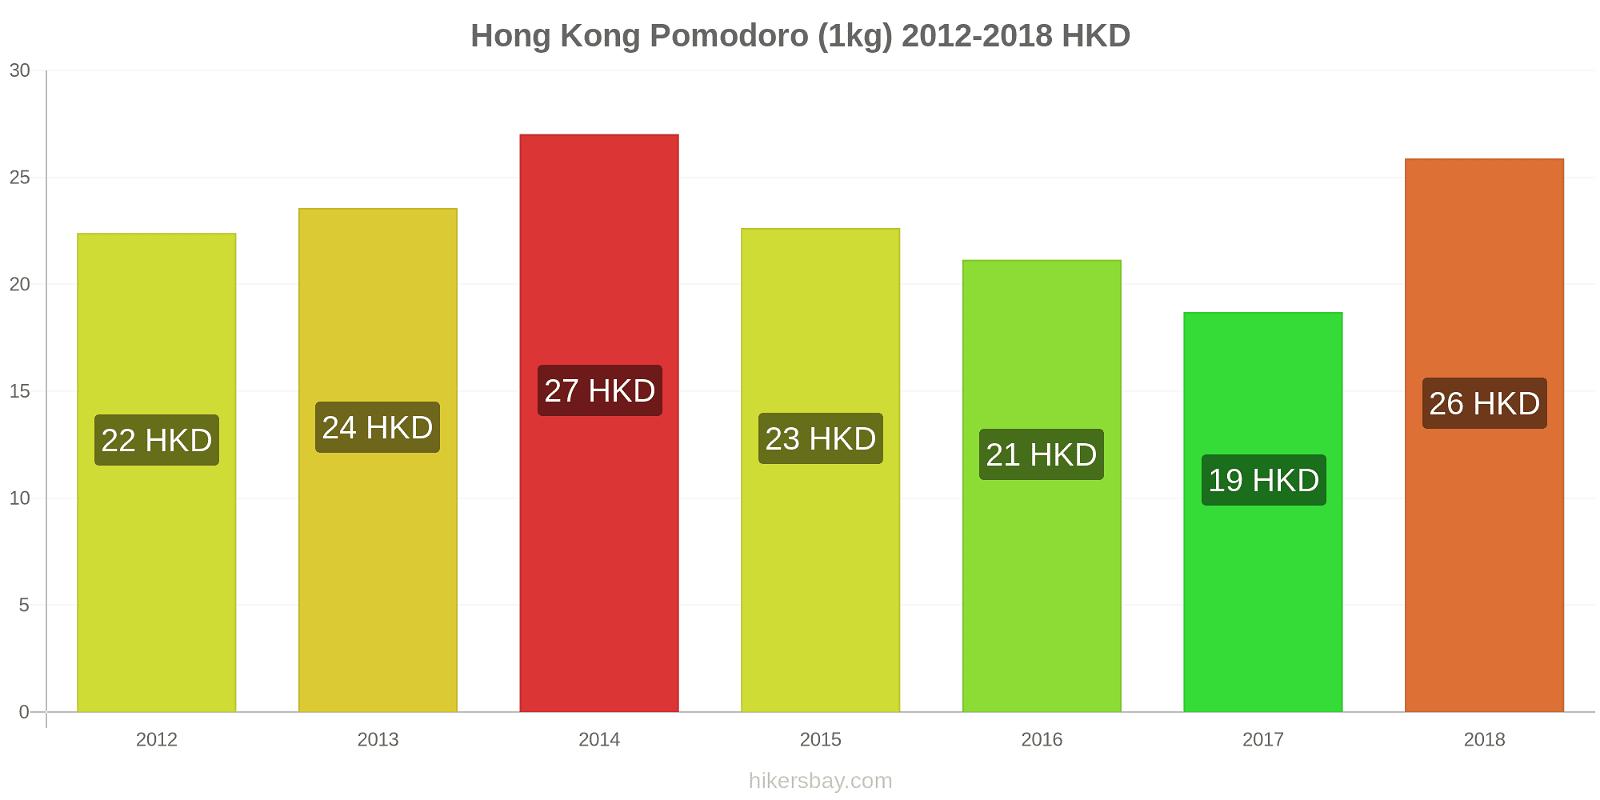 Hong Kong variazioni di prezzo Pomodoro (1kg) hikersbay.com